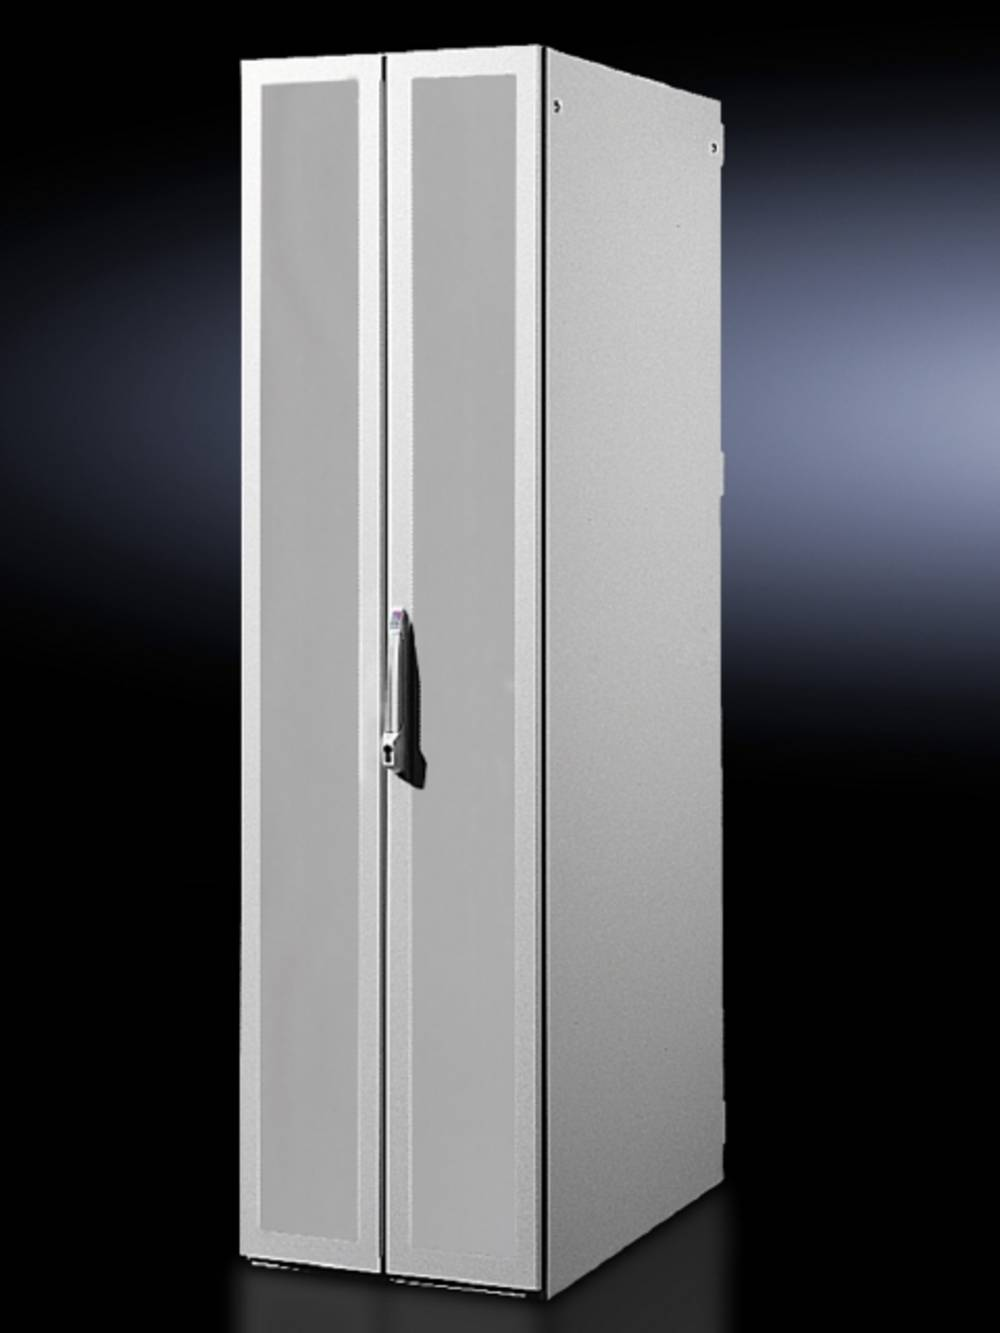 Dør med rude Rittal DK 7816.382 lukket (B x H) 800 mm x 2200 mm Stålplade Lysegrå (RAL 7035) 1 stk